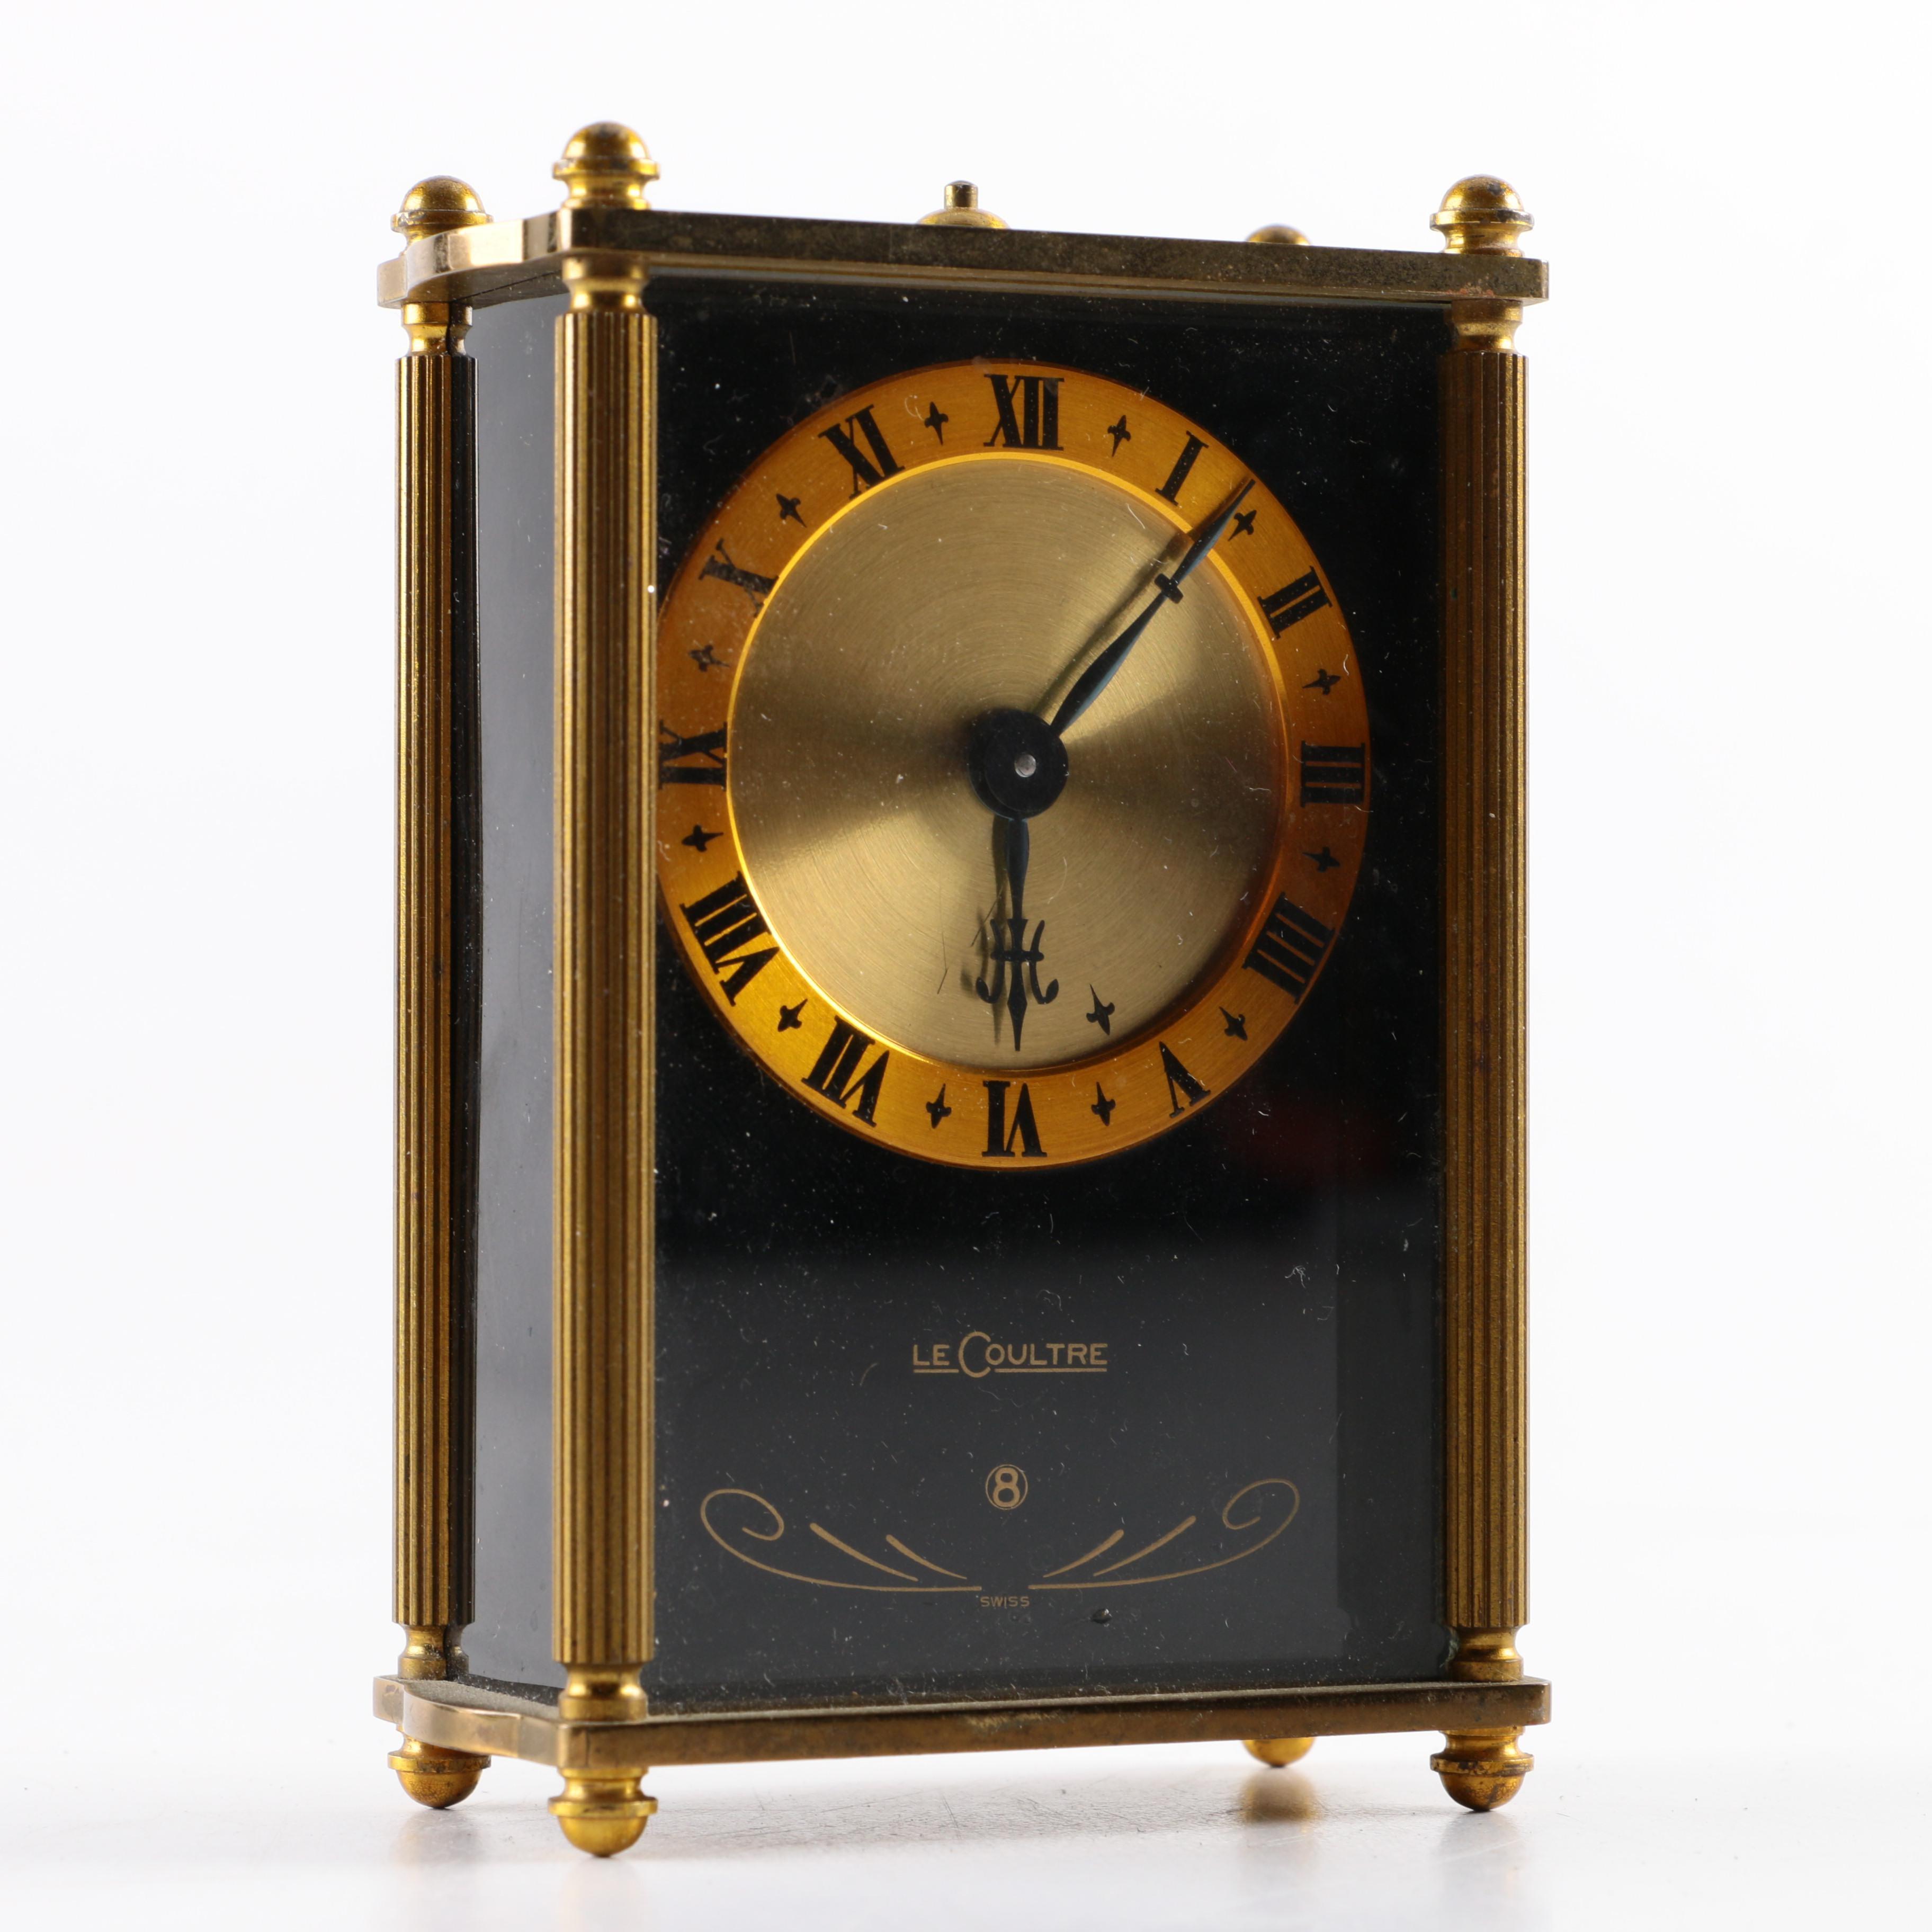 Antique swiss mantel clock